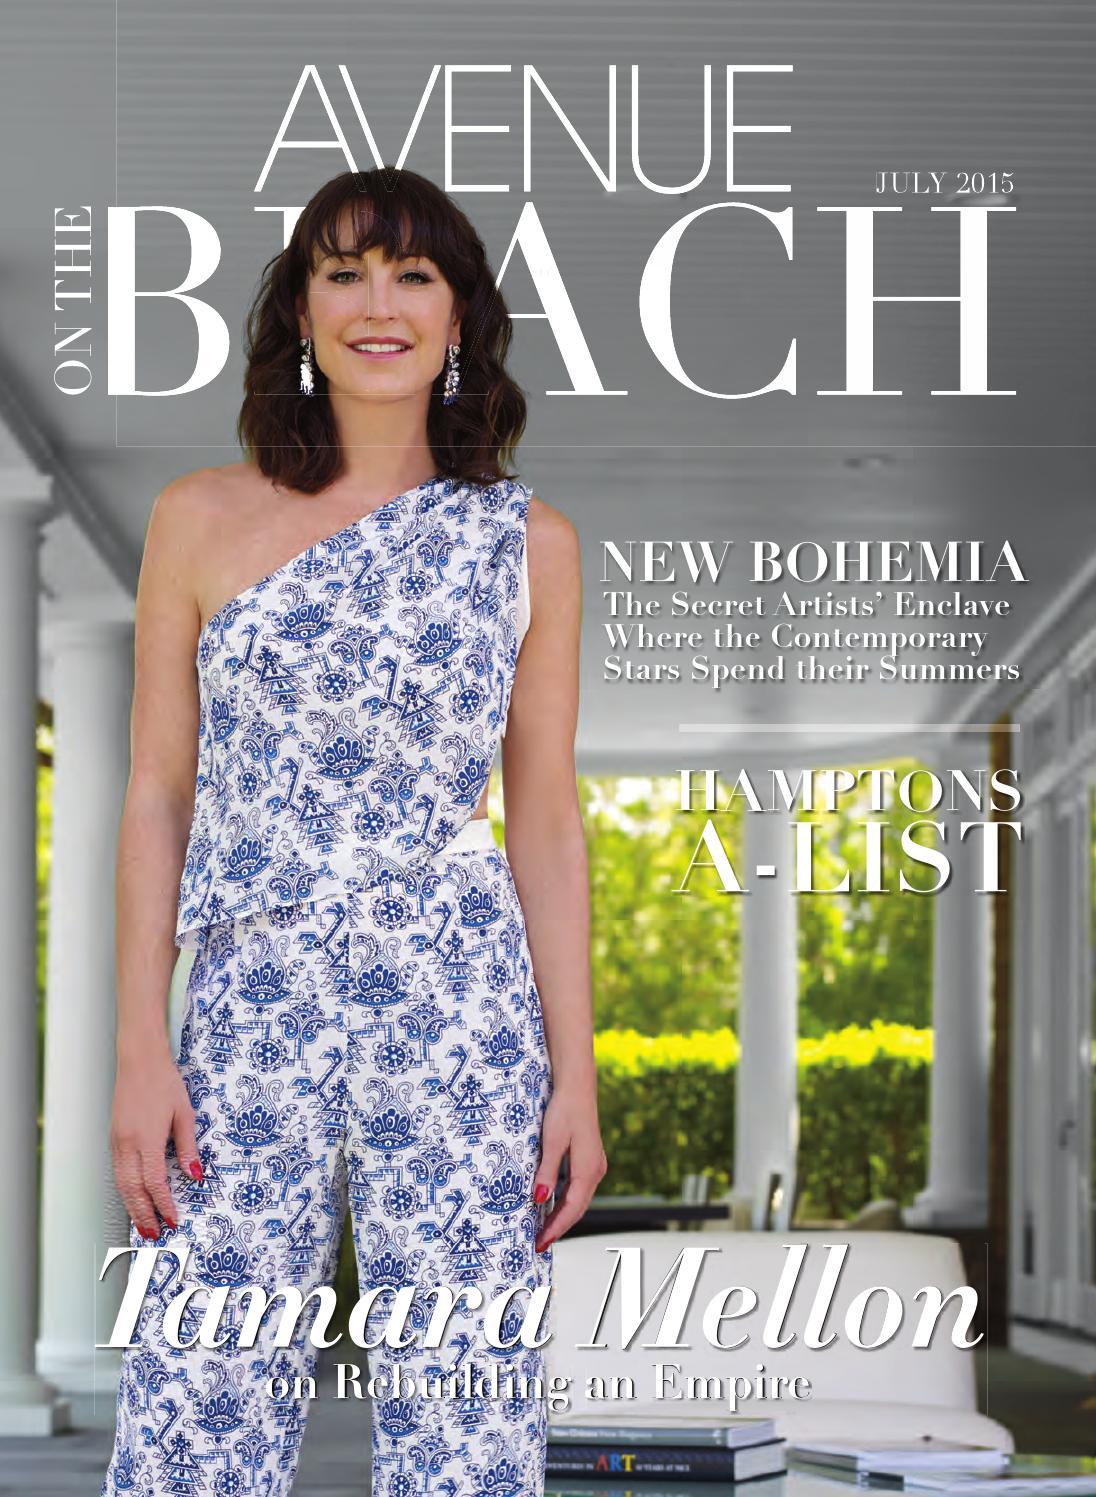 cd3b79b79dc AVENUE ON THE BEACH July 2015 by AVENUE Magazine - issuu